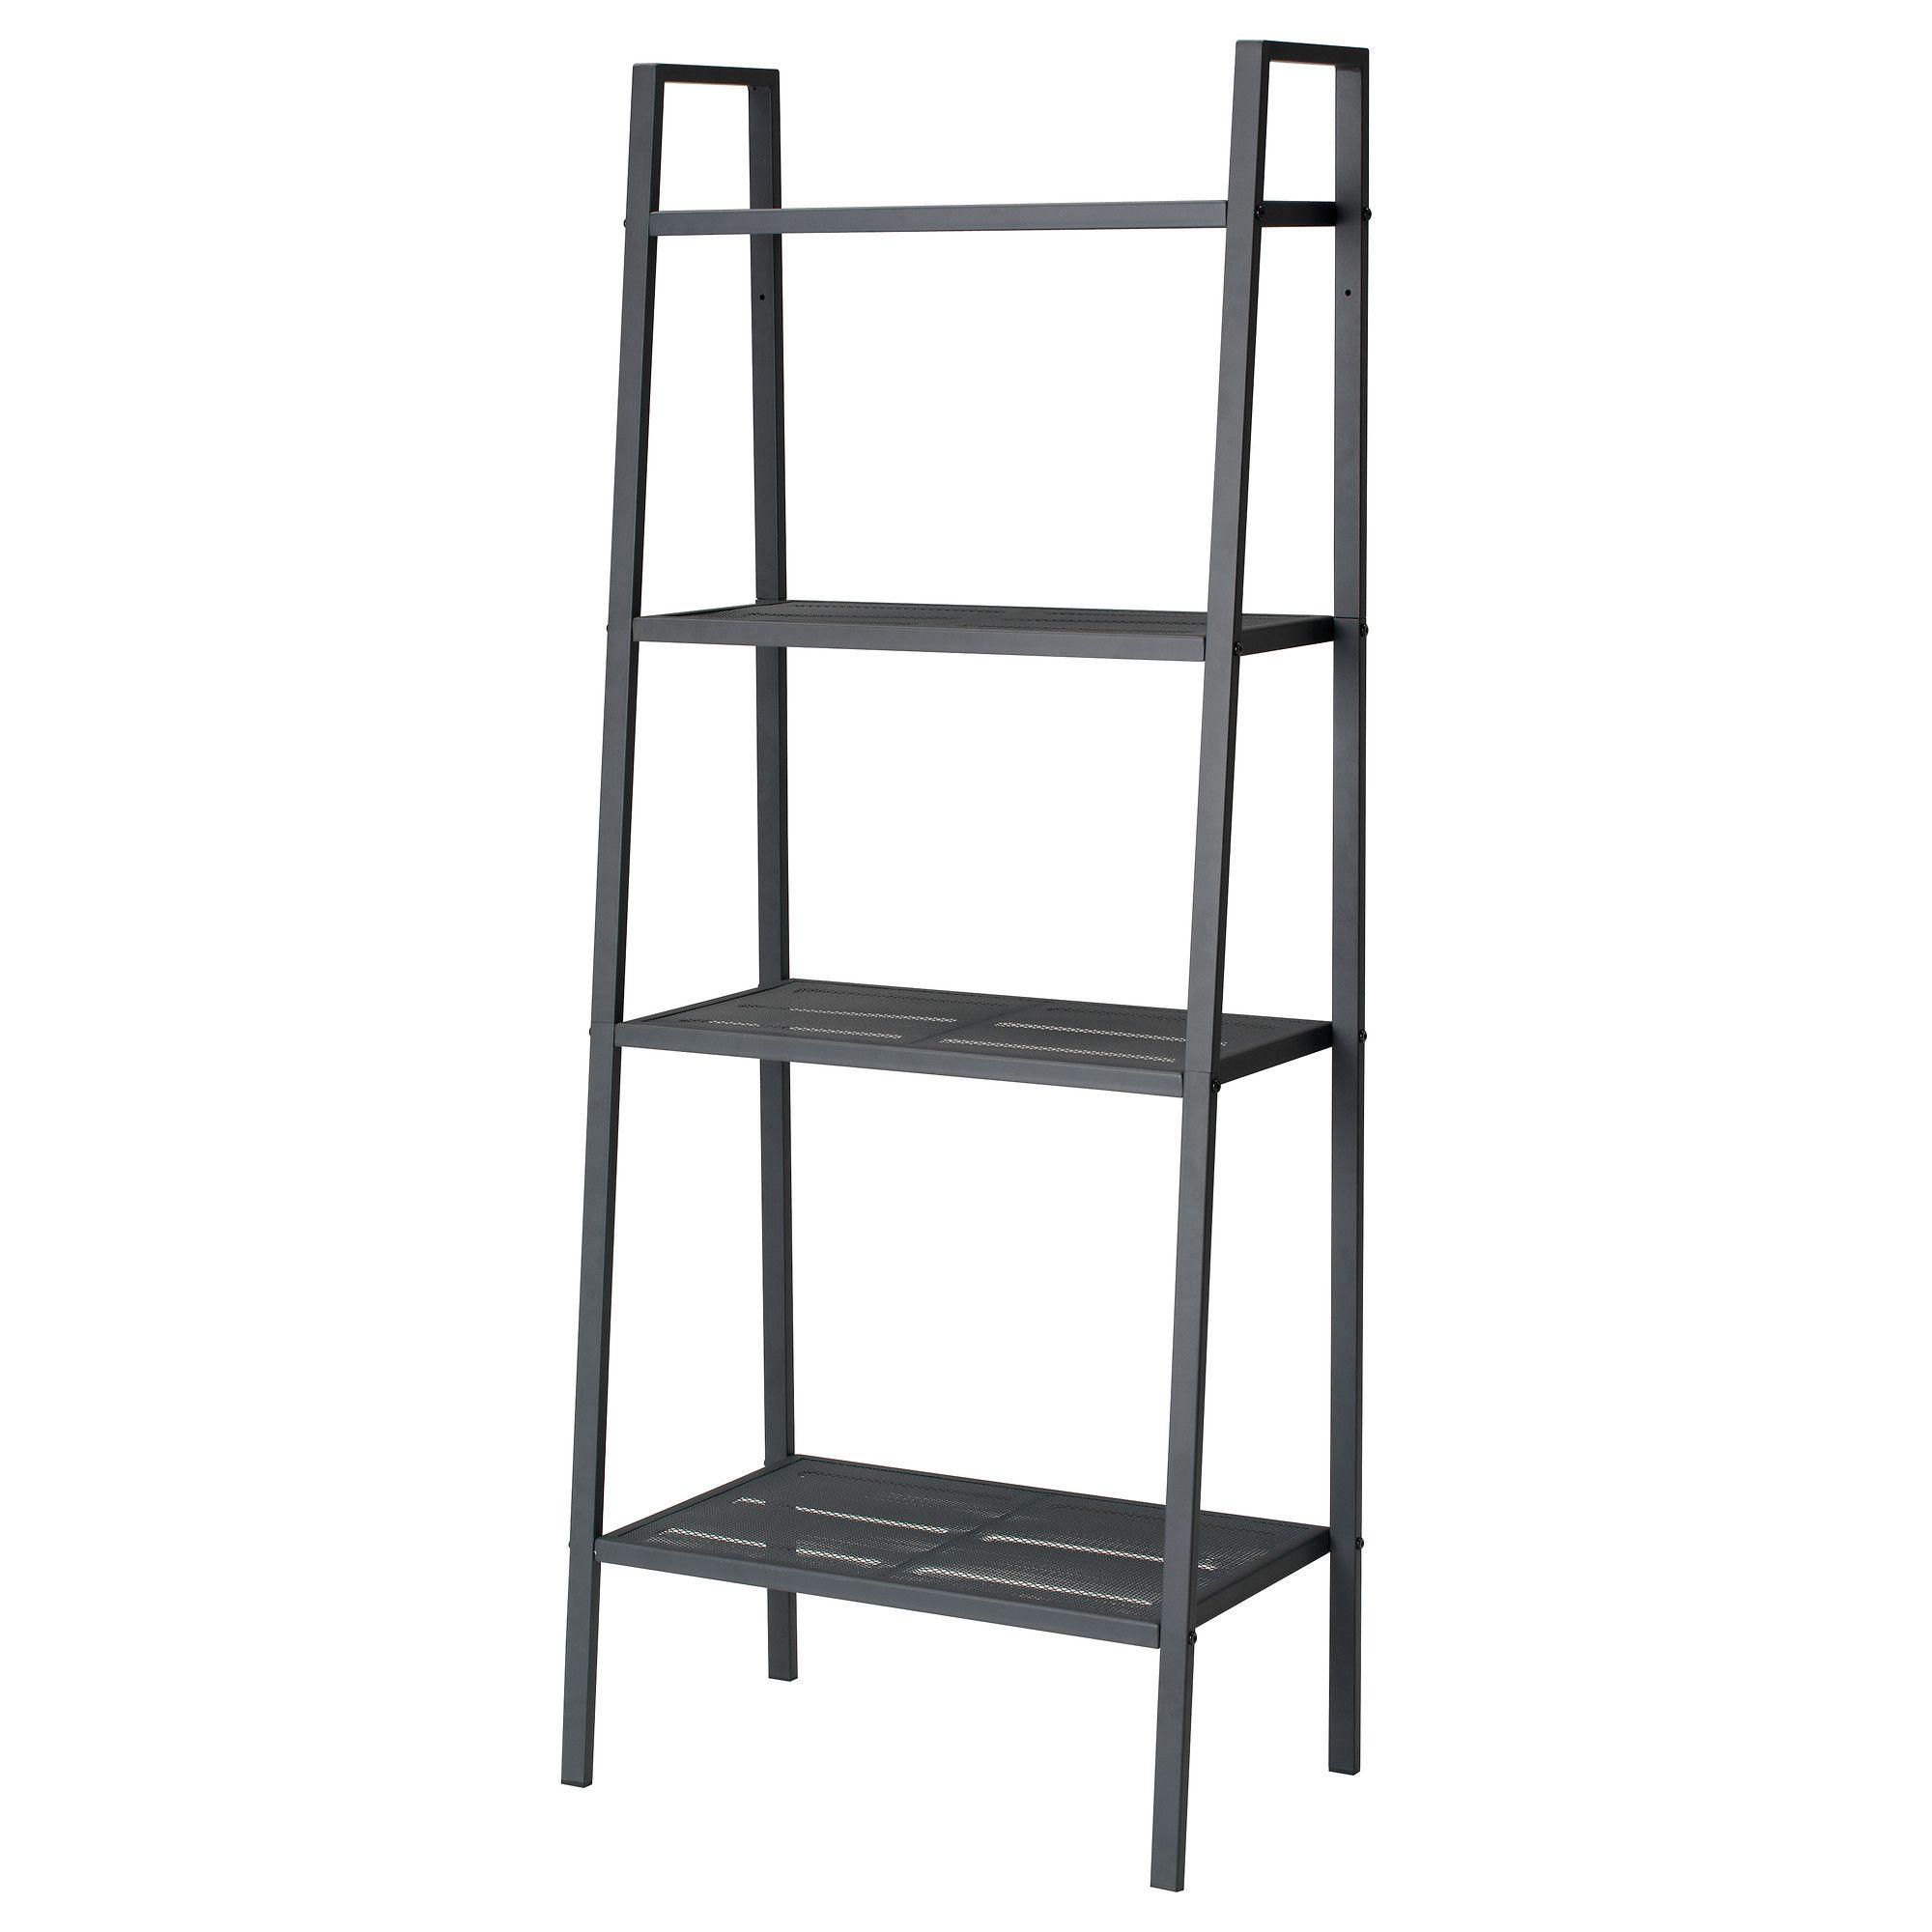 32be961570d089b8de881c5fcf017e32 Incroyable De Table Balcon Suspendue Ikea Concept